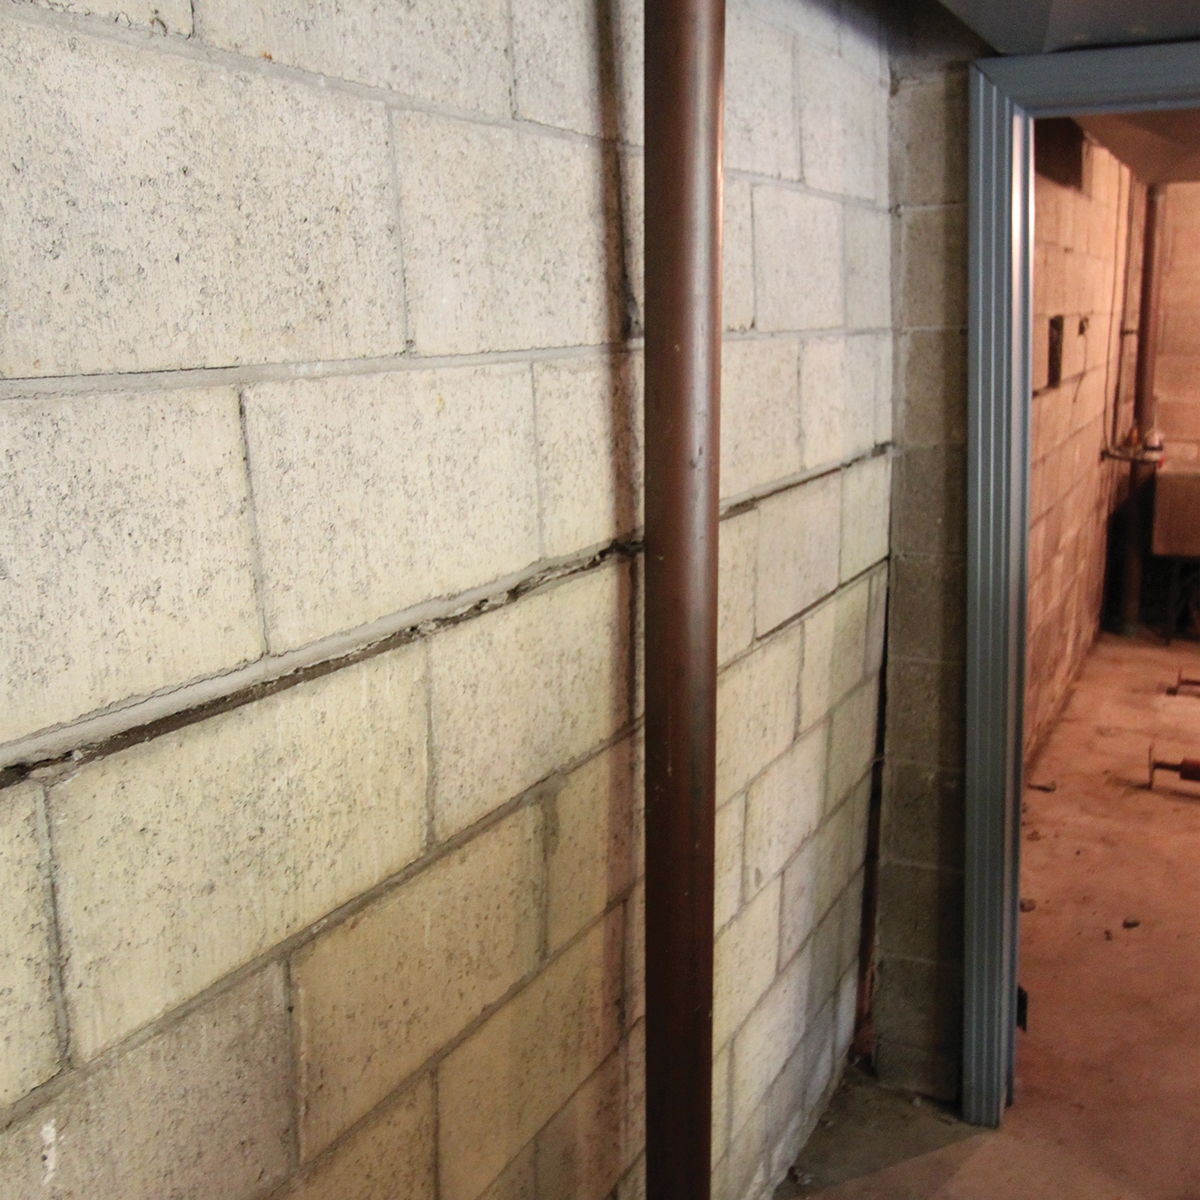 Fixing Basement Walls Bowed